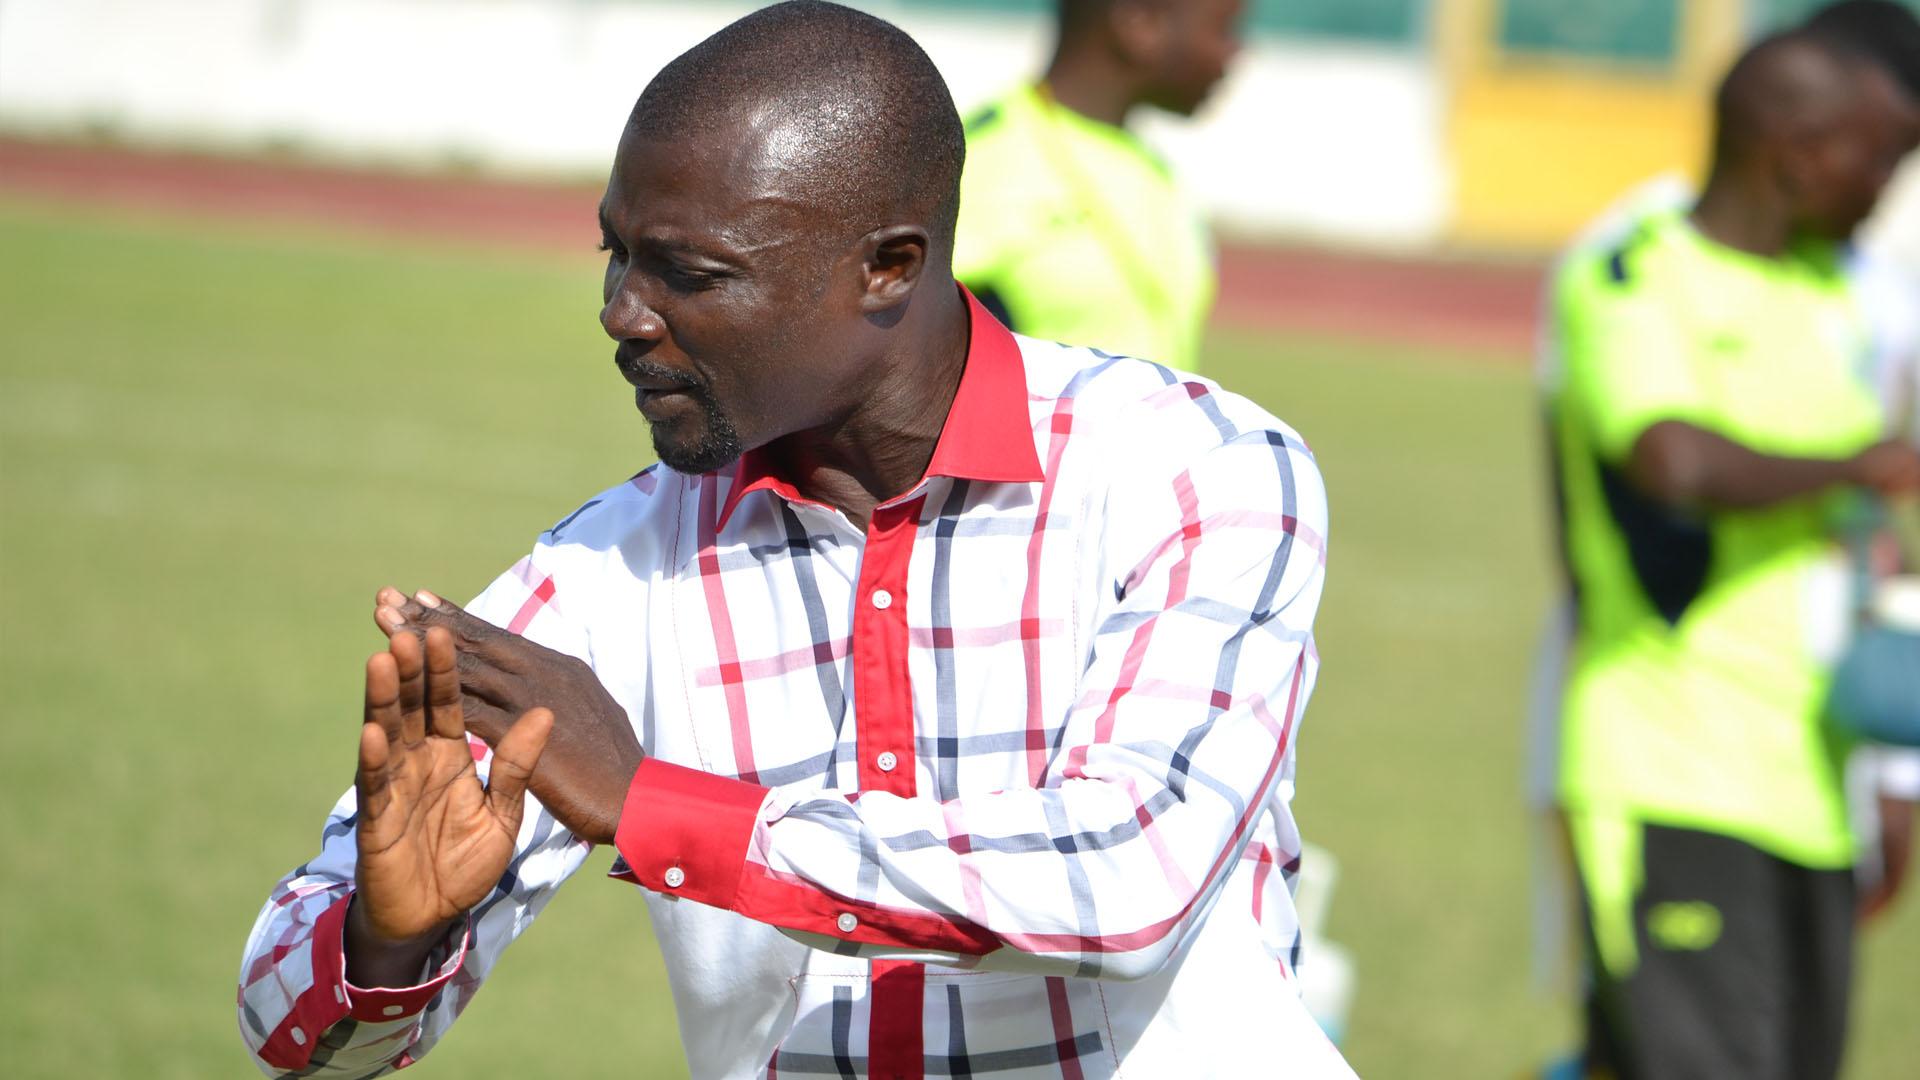 Wa All Stars coach Enos Adepa